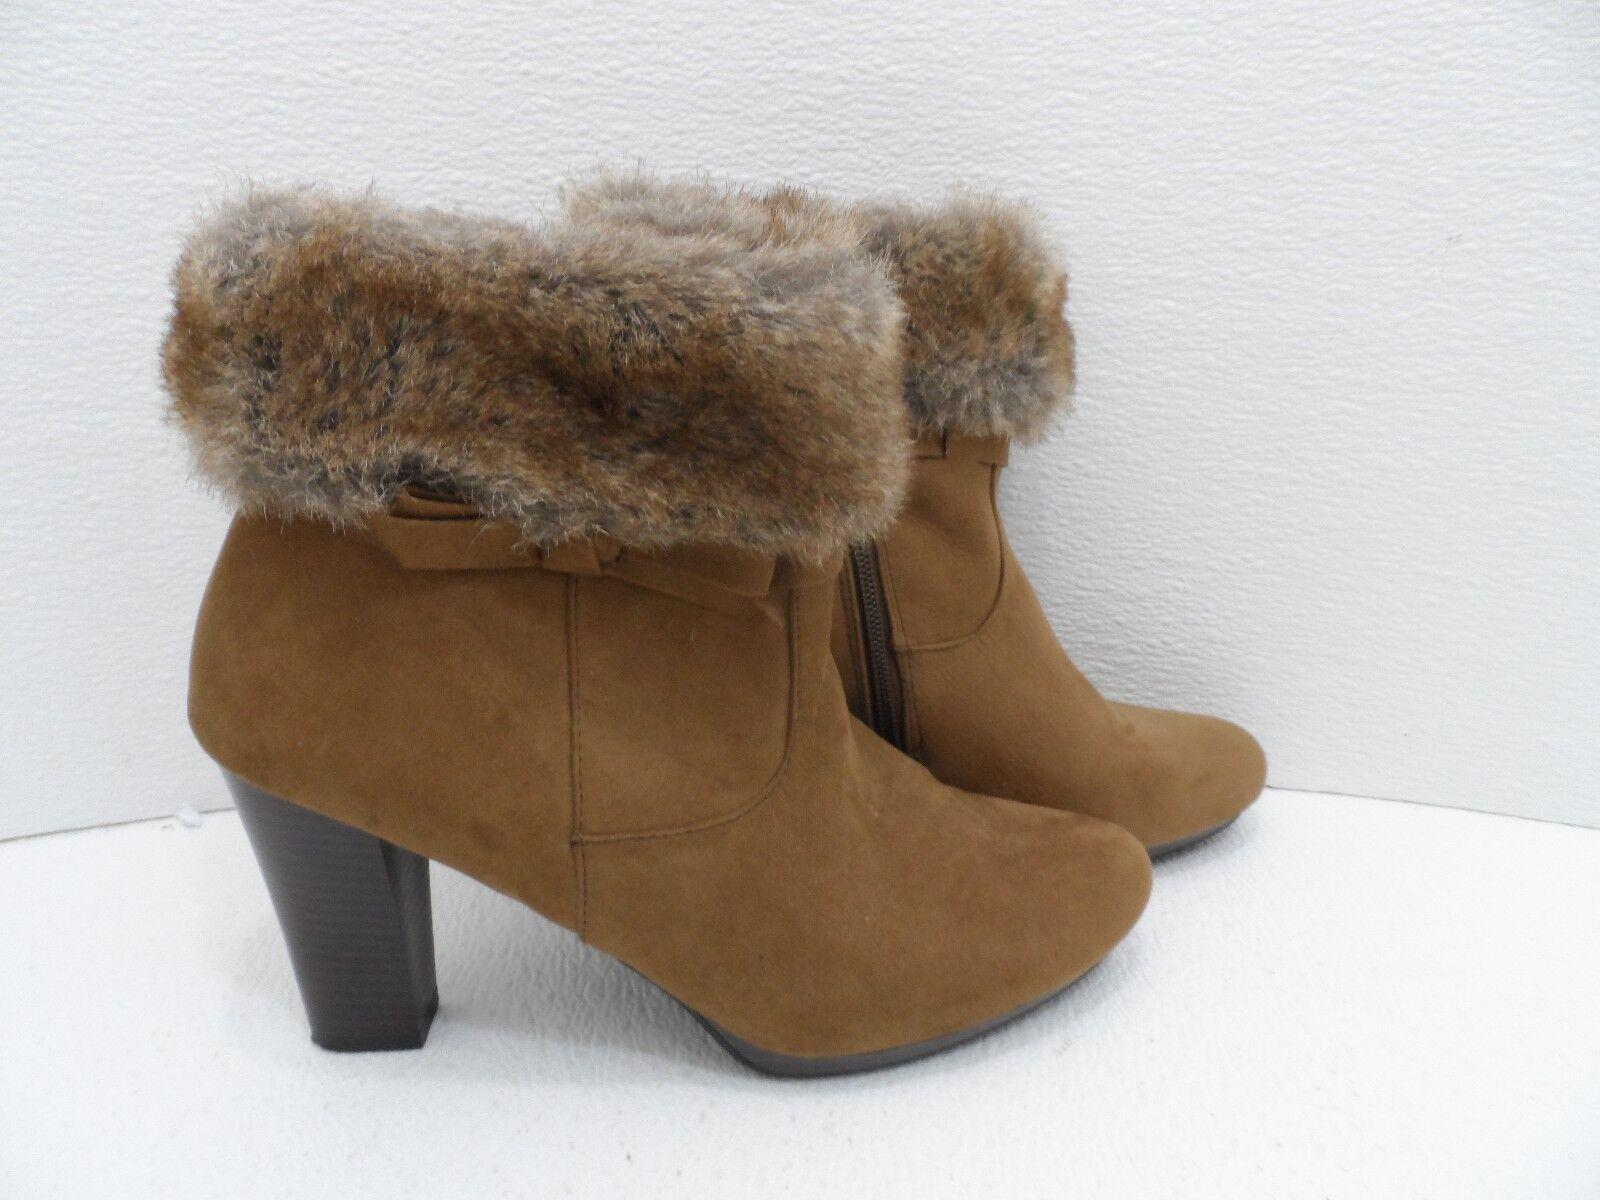 0945b3199b2e Dana Buchman Faux - Suede - and Fur Ankle Boots - Boots Tan - Size 10M -  VGC 932e327